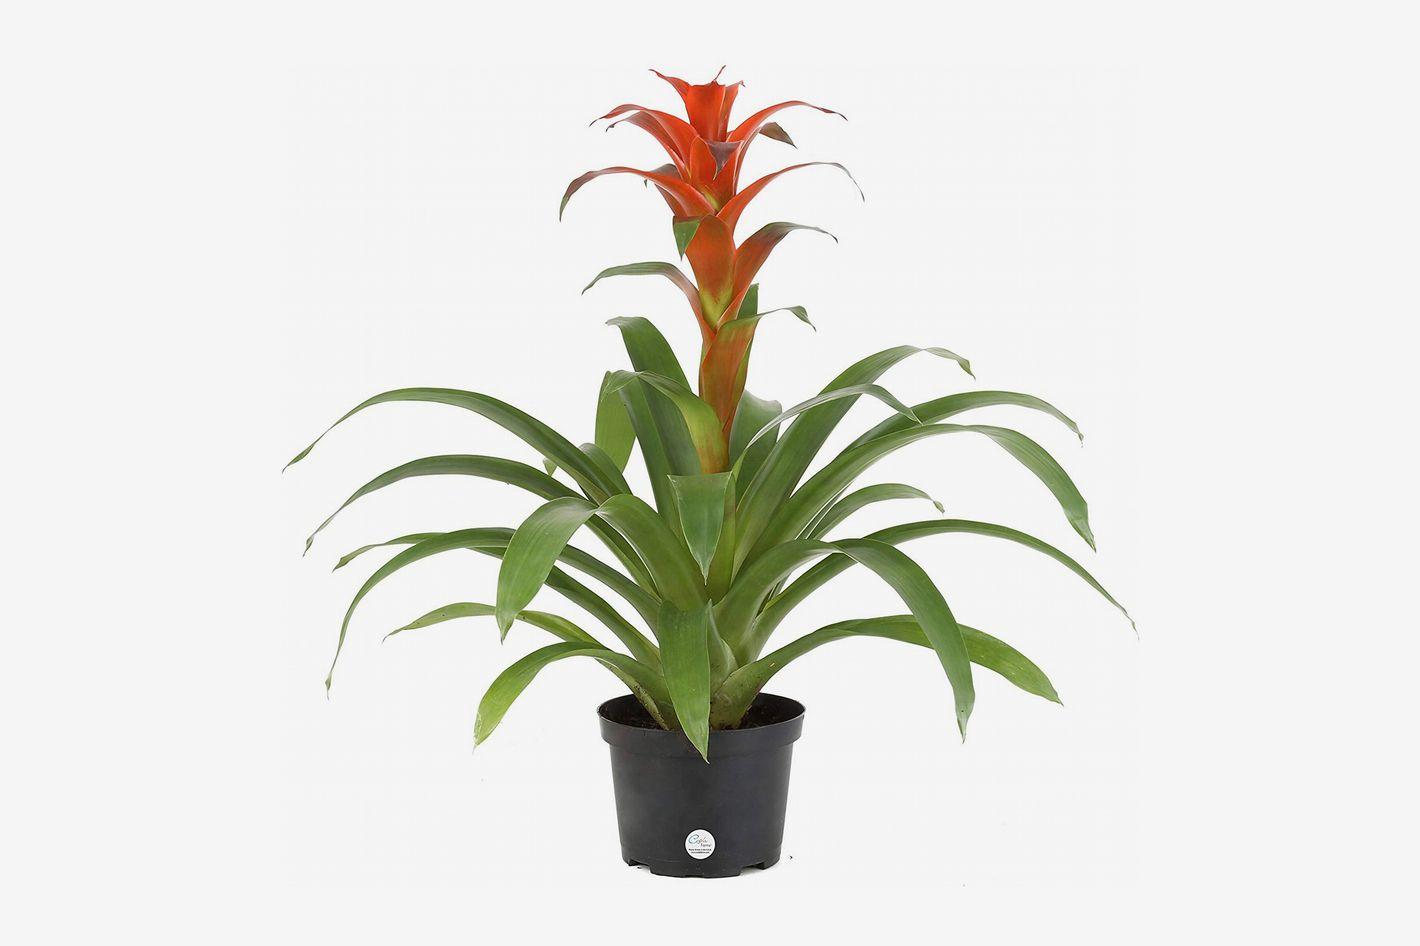 Costa Farms Bromeliad in 6-Inch Grower's Pot